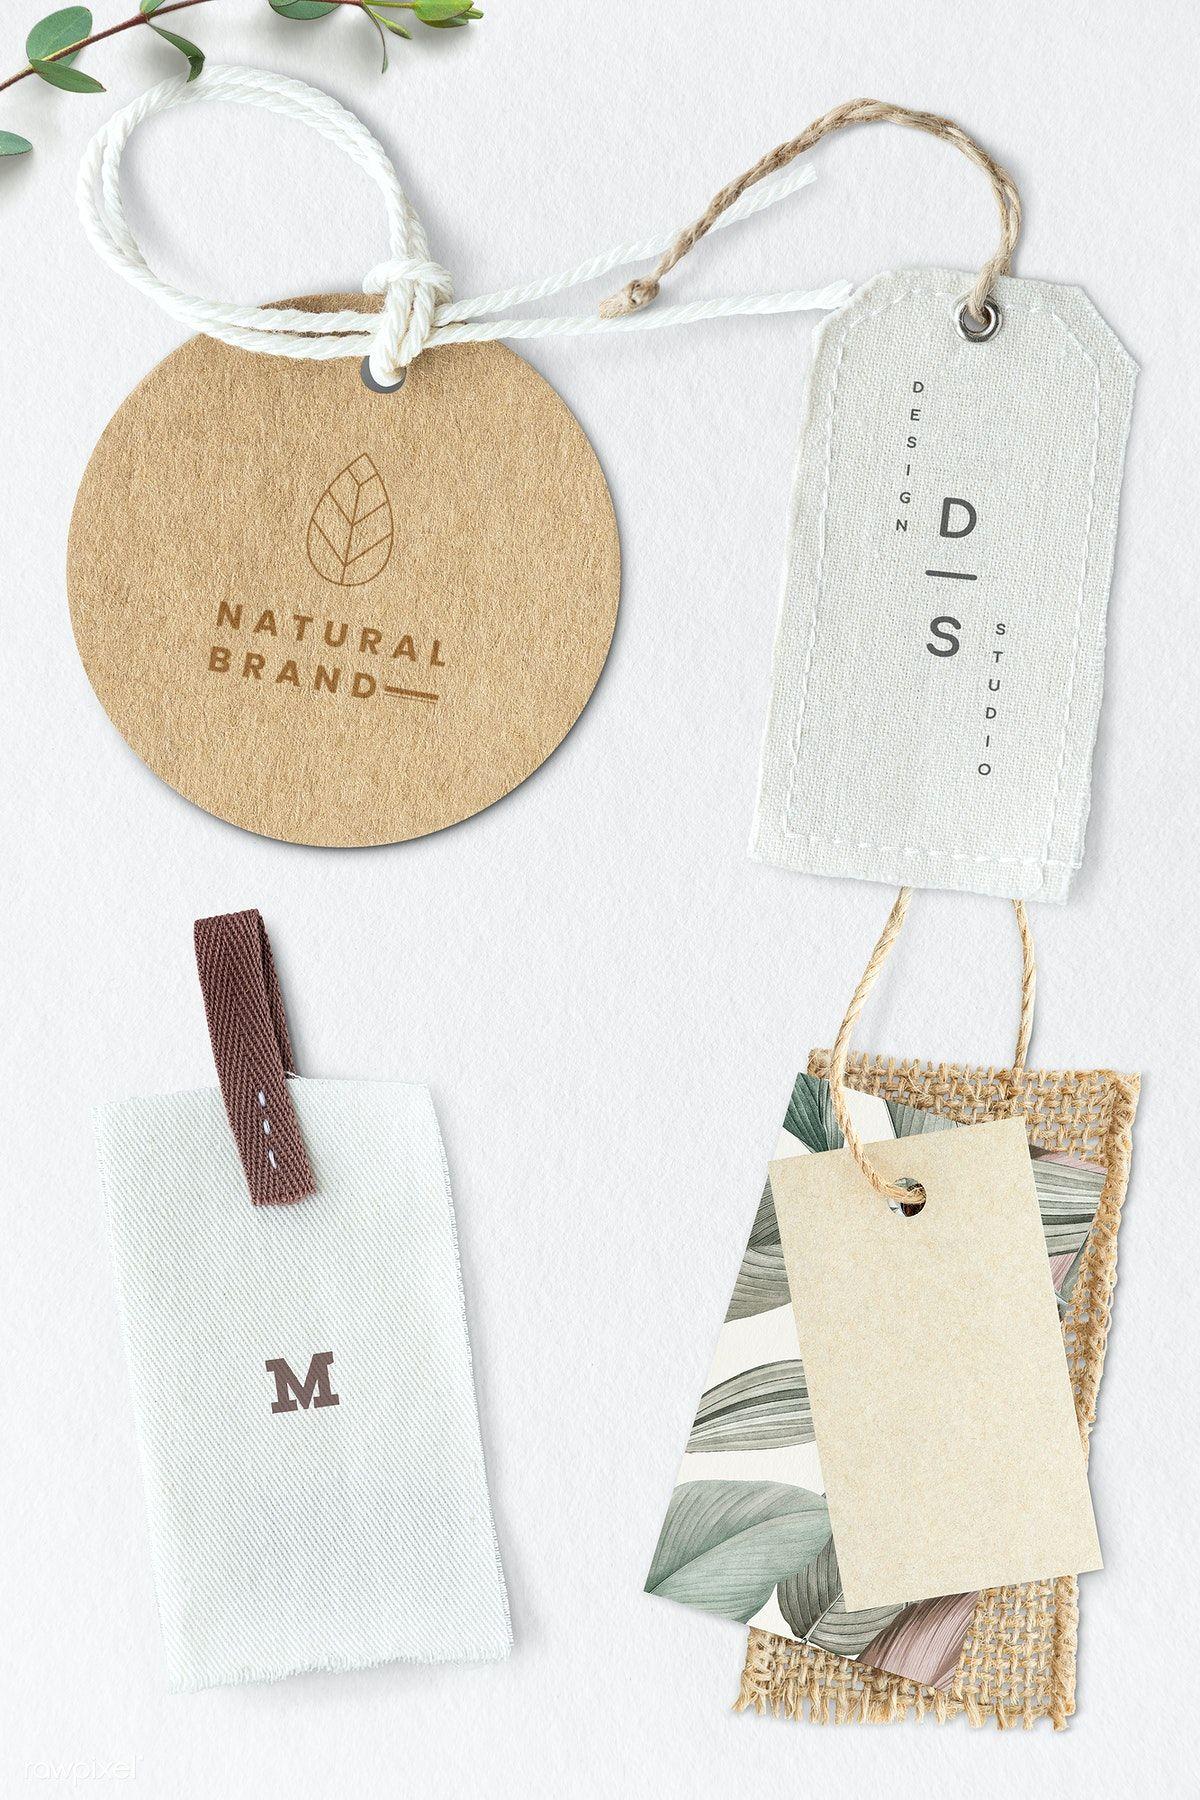 Download Download Premium Psd Of Blank Fashion Brand Label Mockup 1202092 In 2020 Organic Branding Brand Guidelines Design Fashion Branding